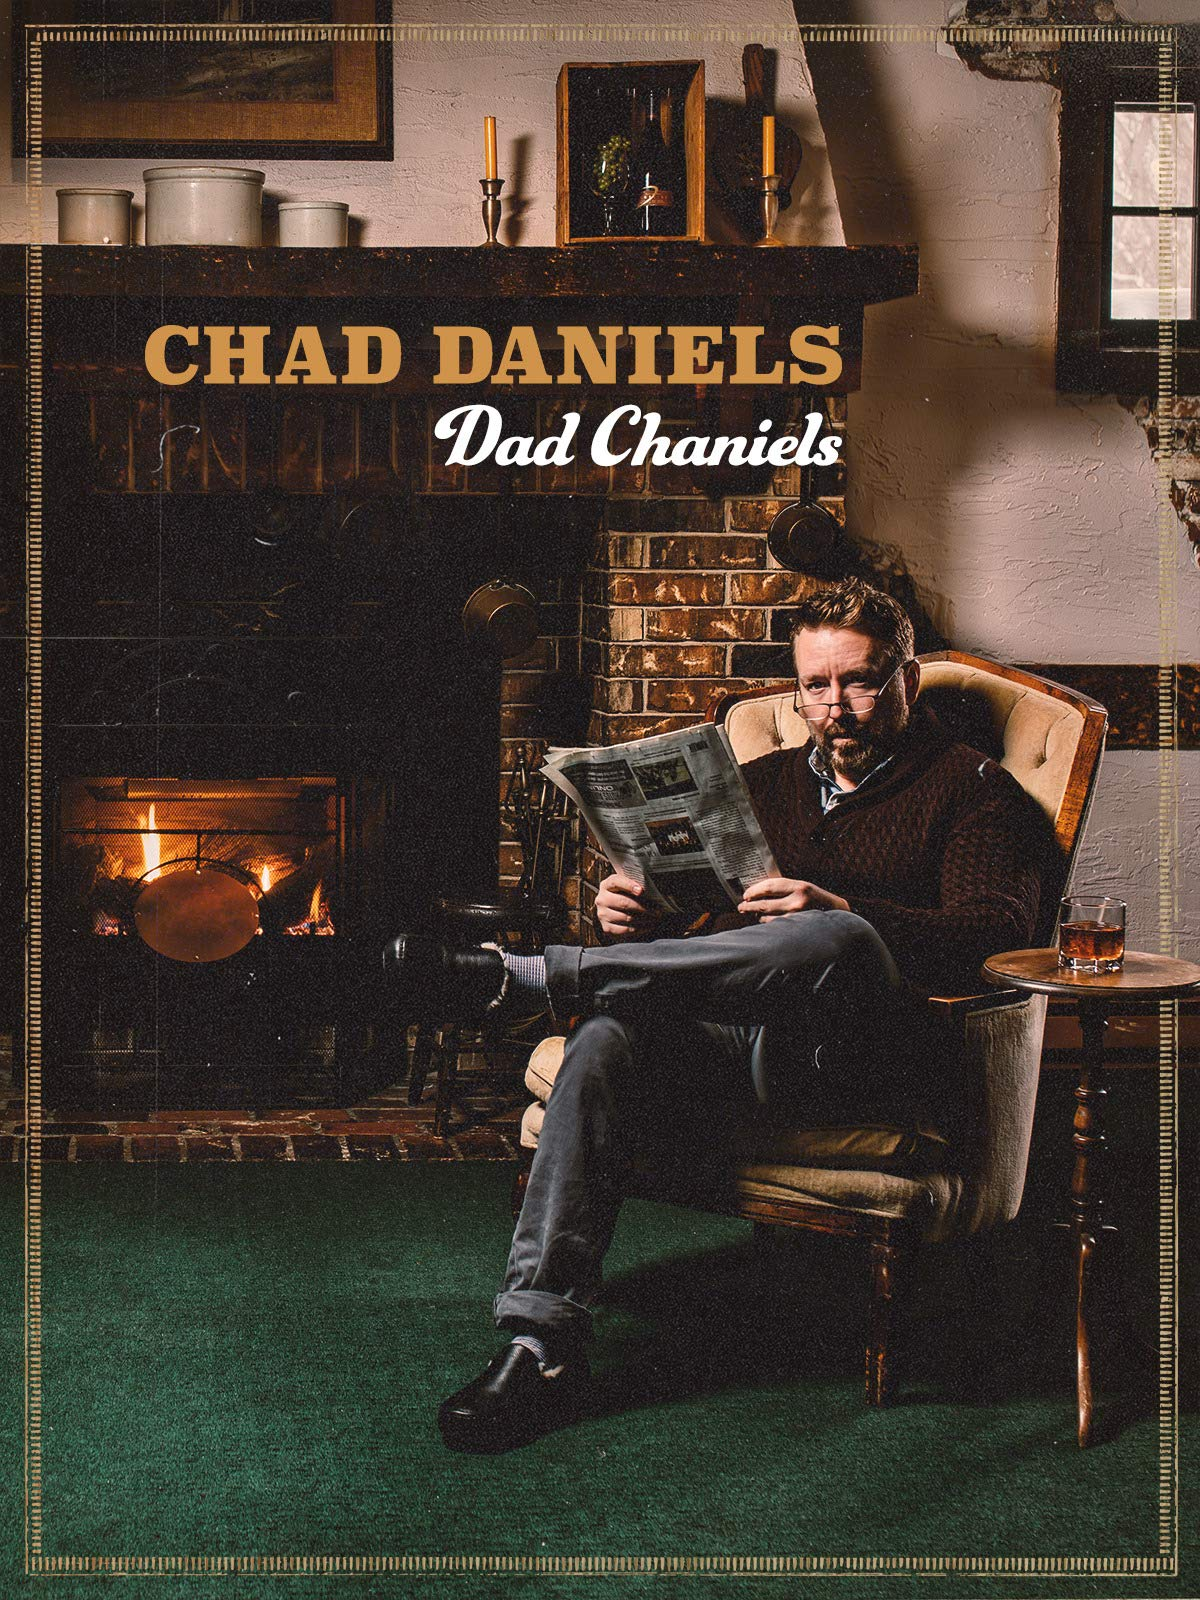 Chad Daniels: Dad Chaniels on Amazon Prime Video UK